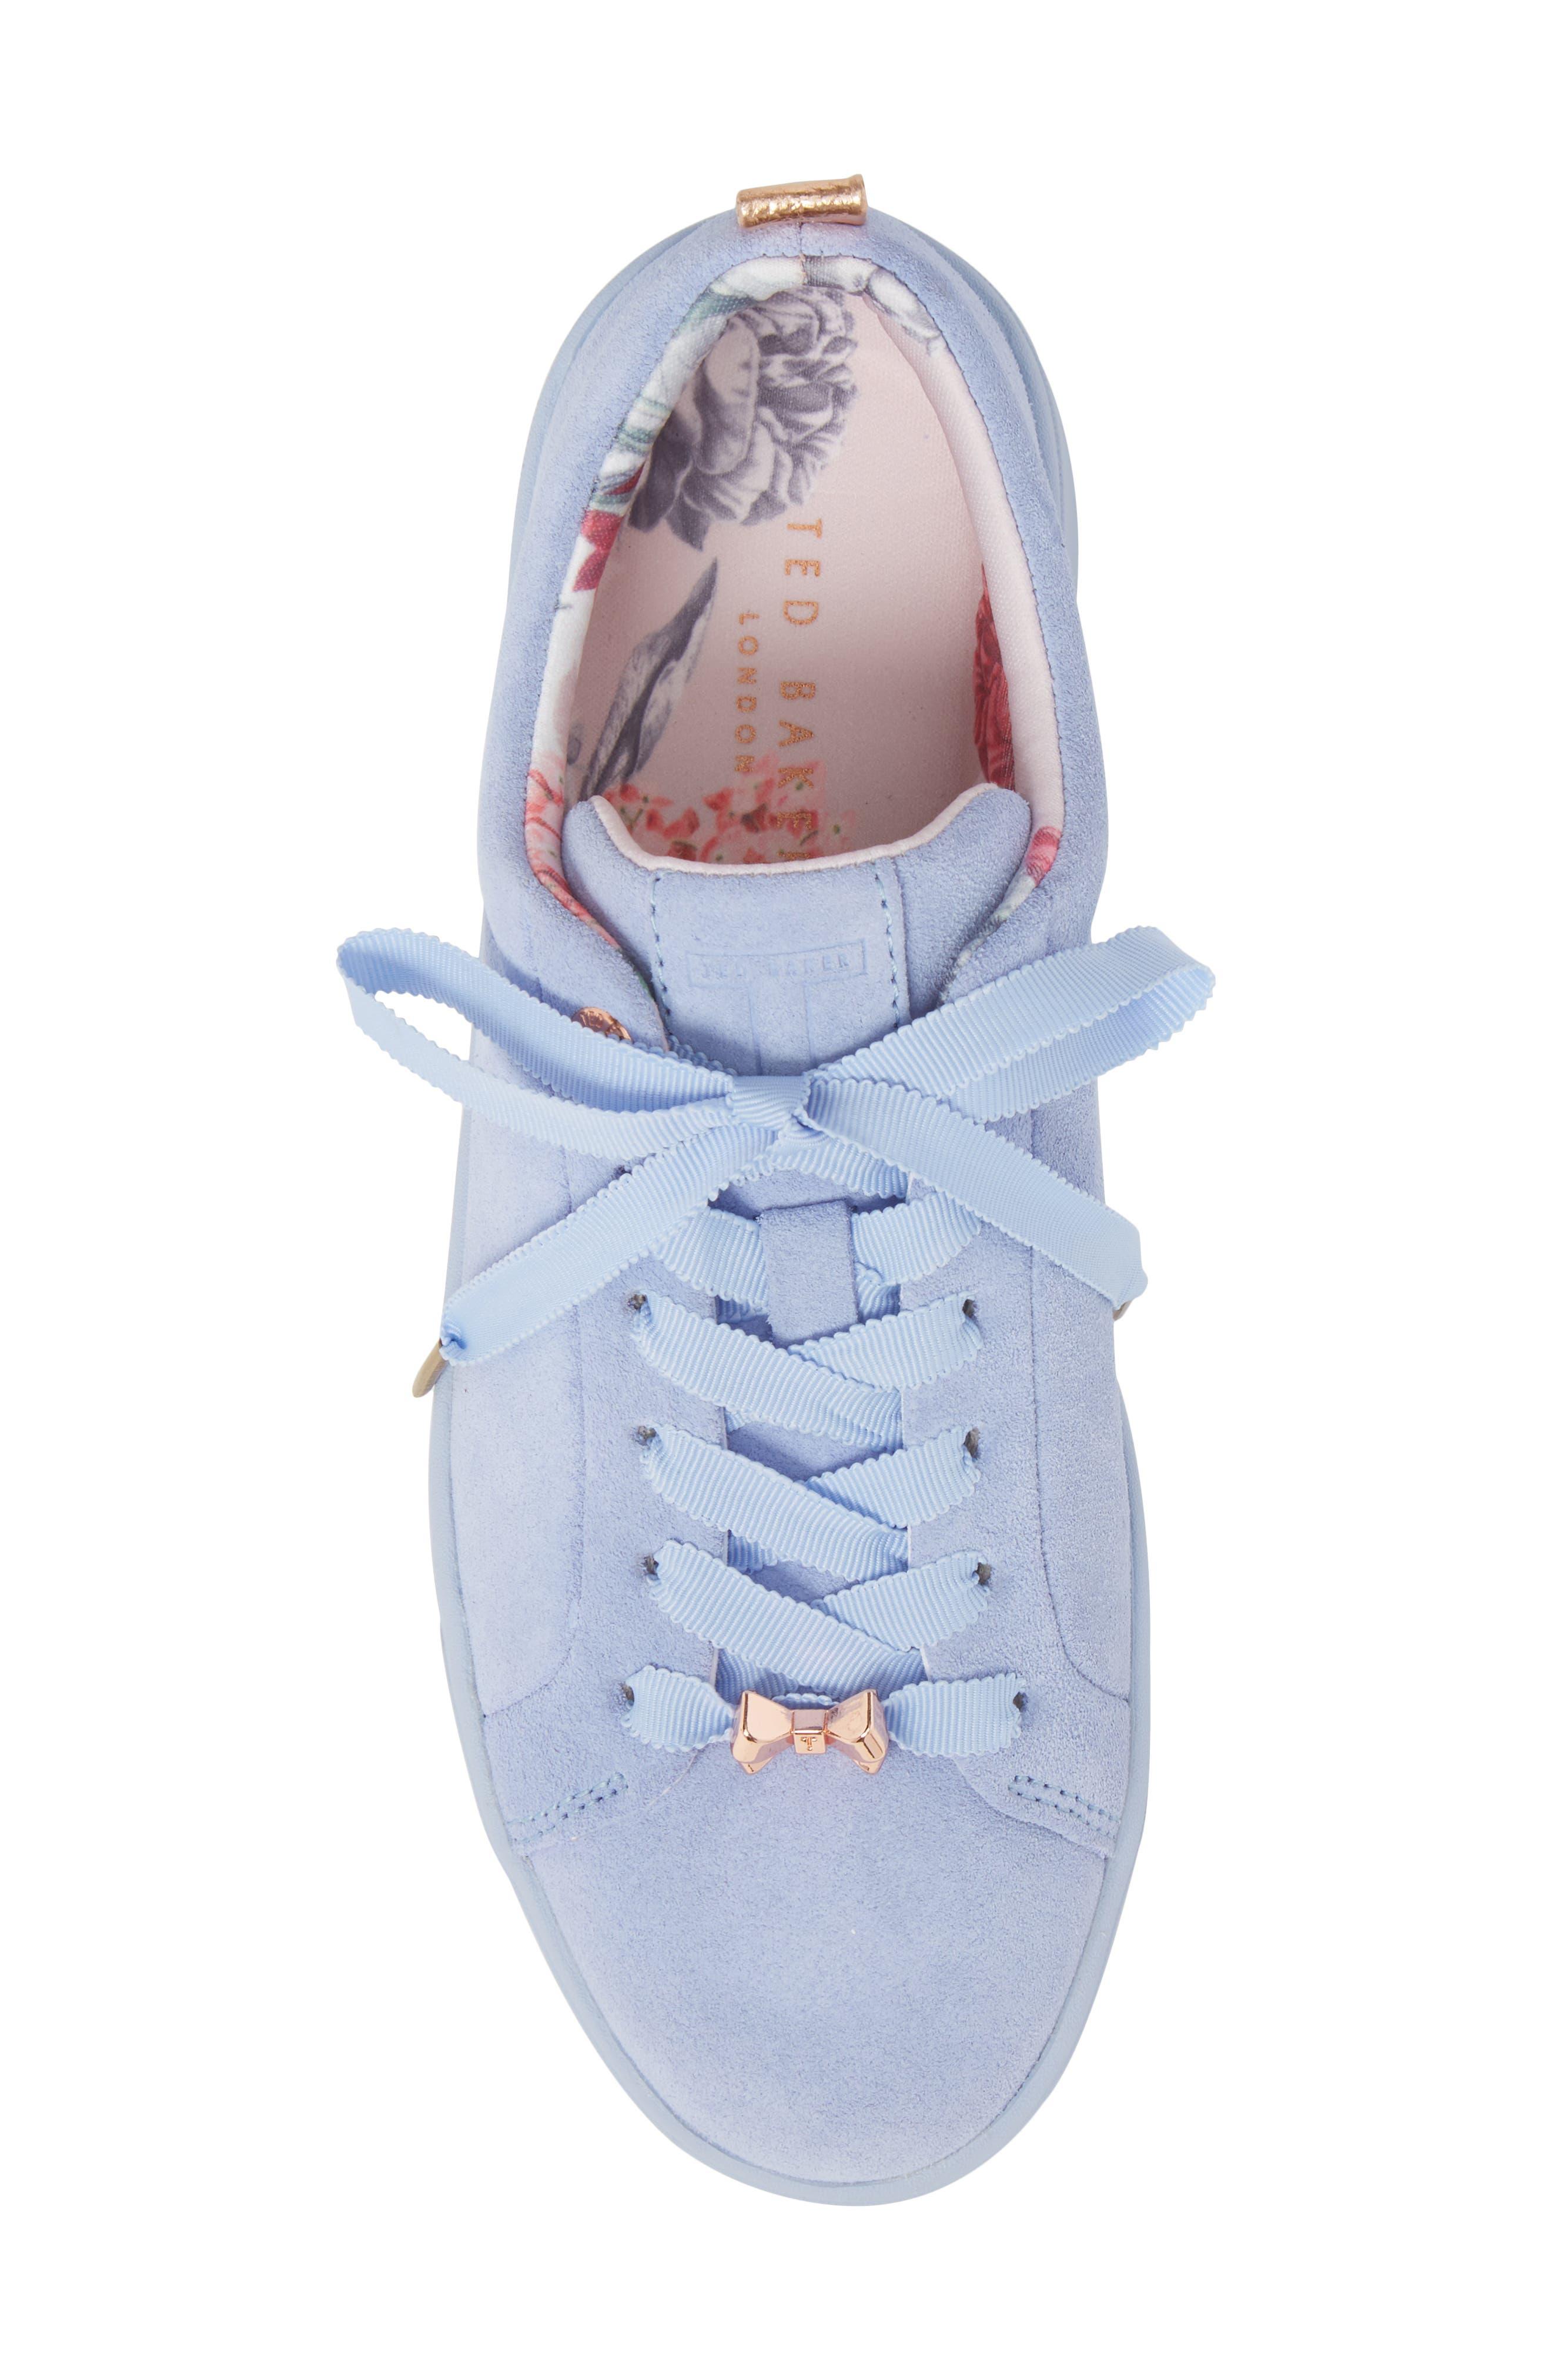 Kelleis Sneaker,                             Alternate thumbnail 5, color,                             Light Blue Suede